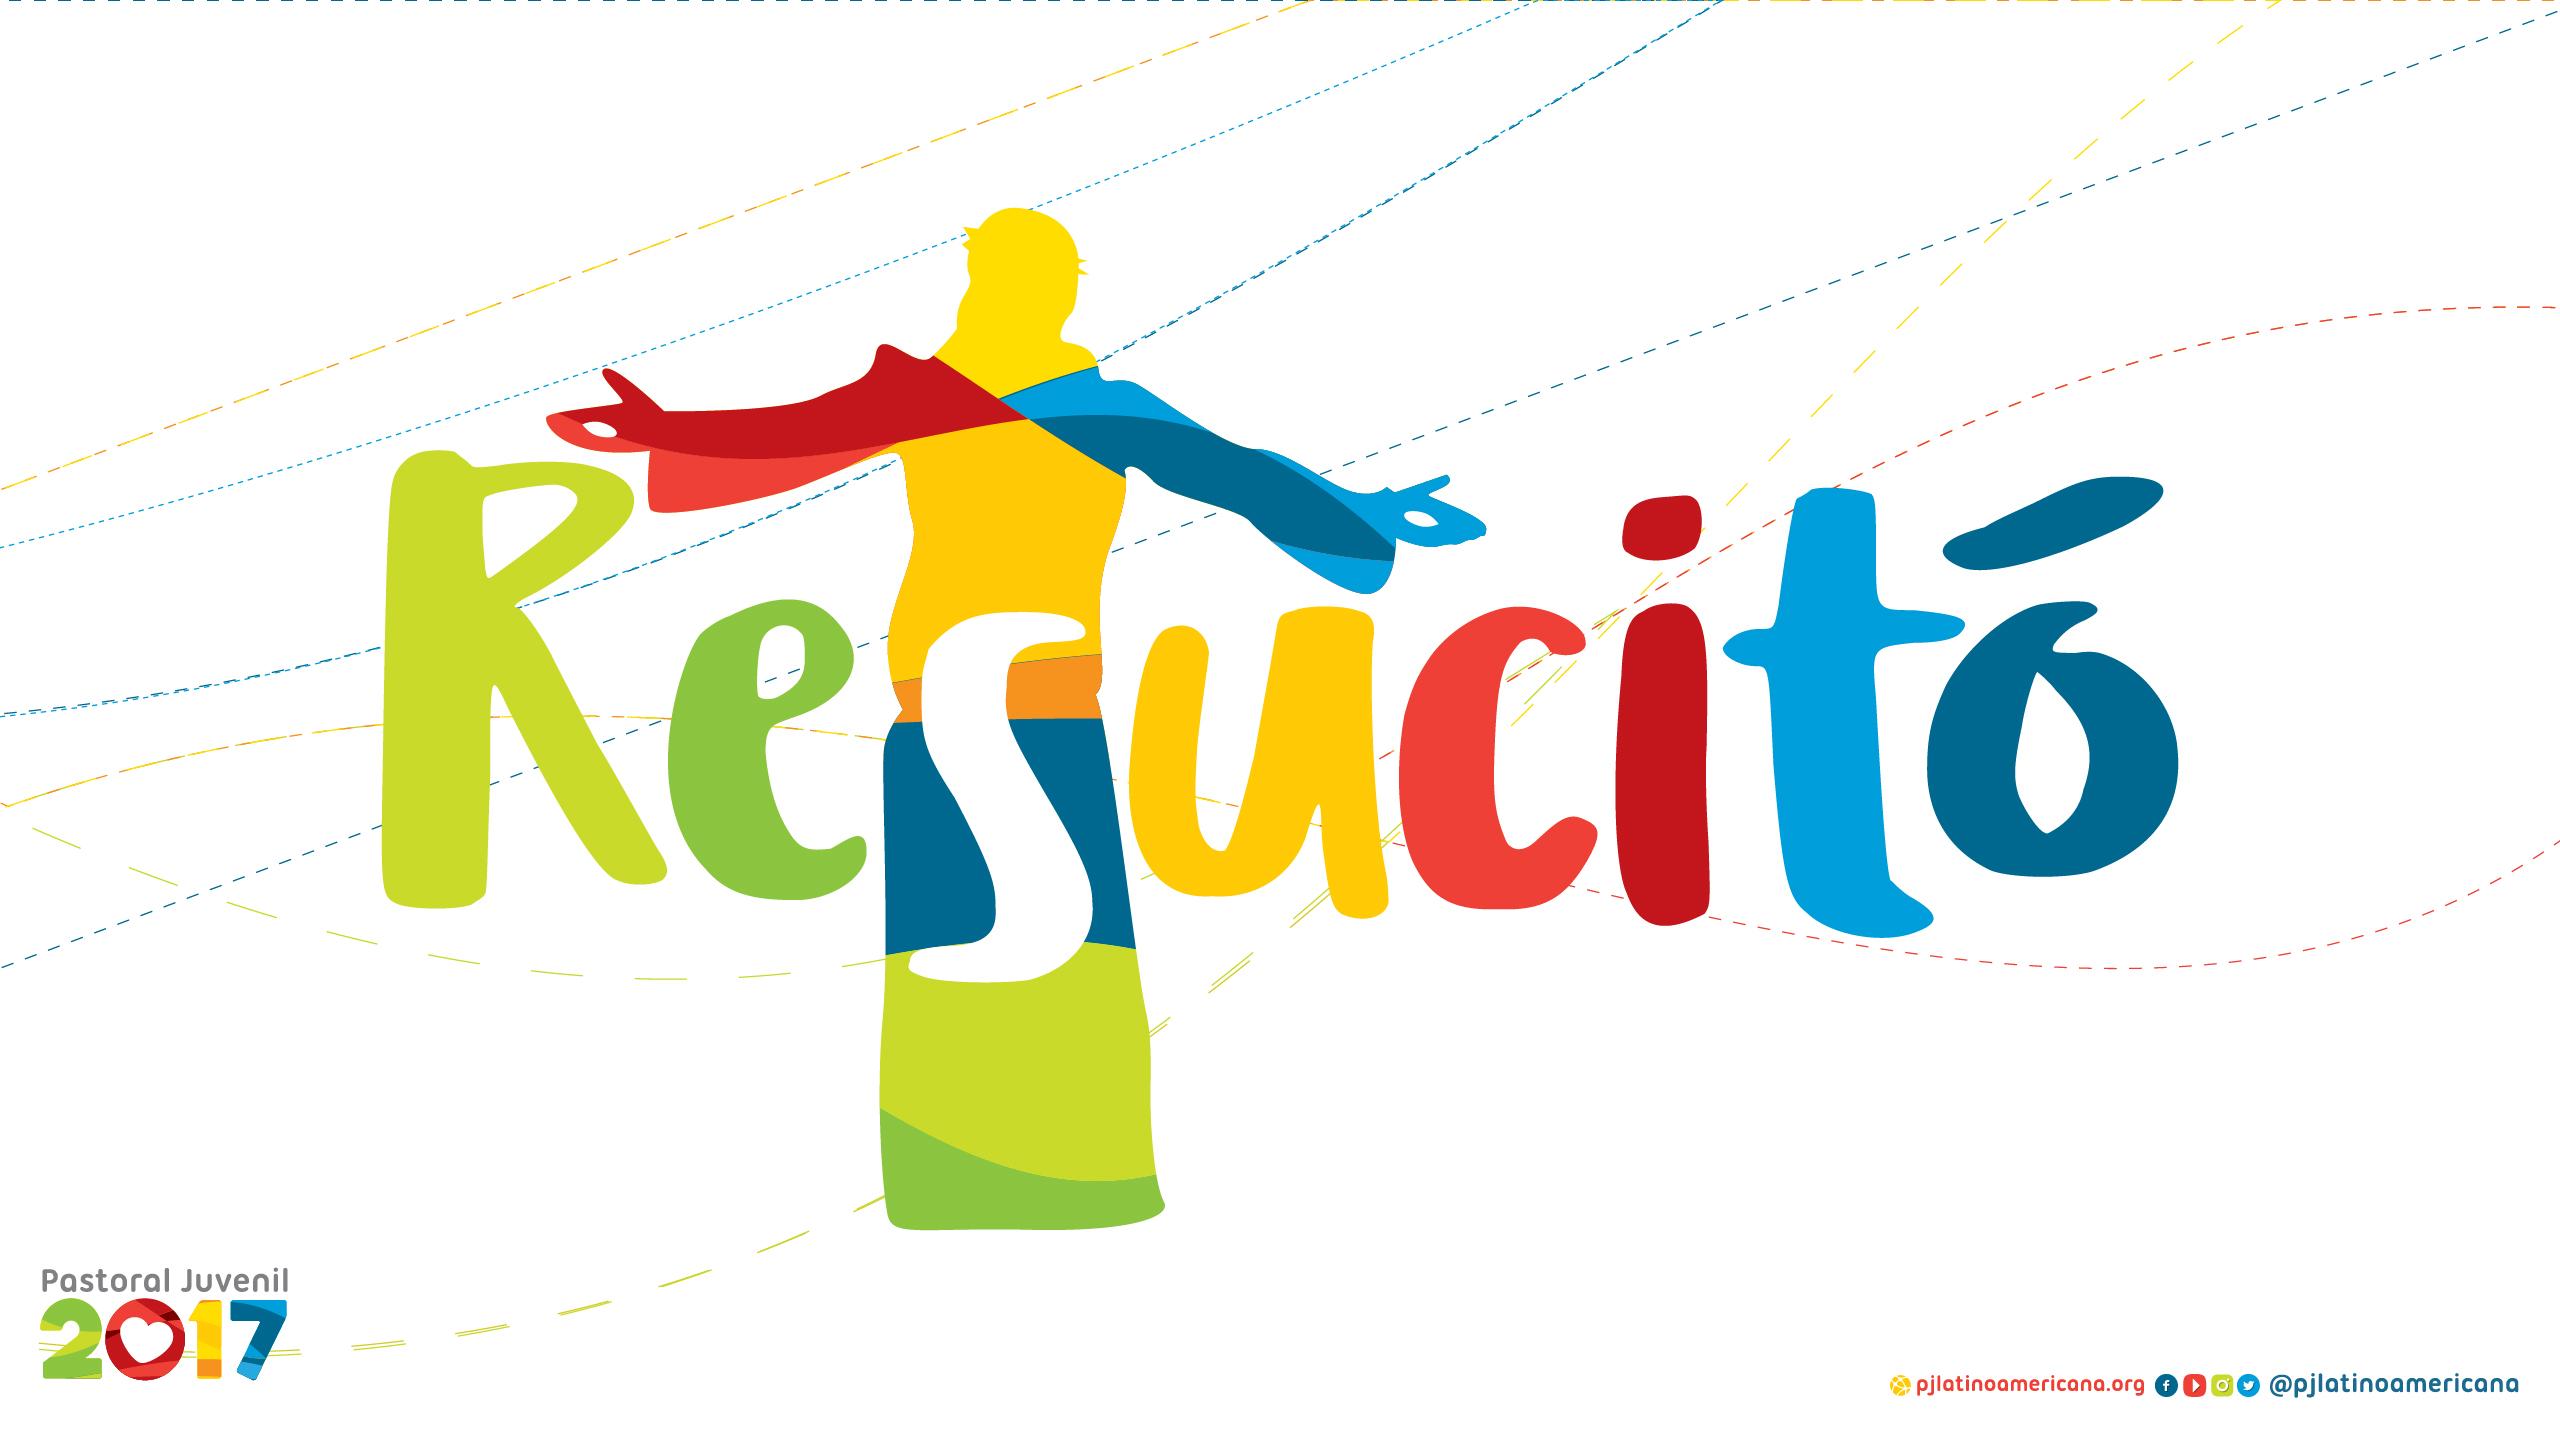 2560x1440 Wallpaper Hd Pastoral Juvenil Latinoamericana 2 0